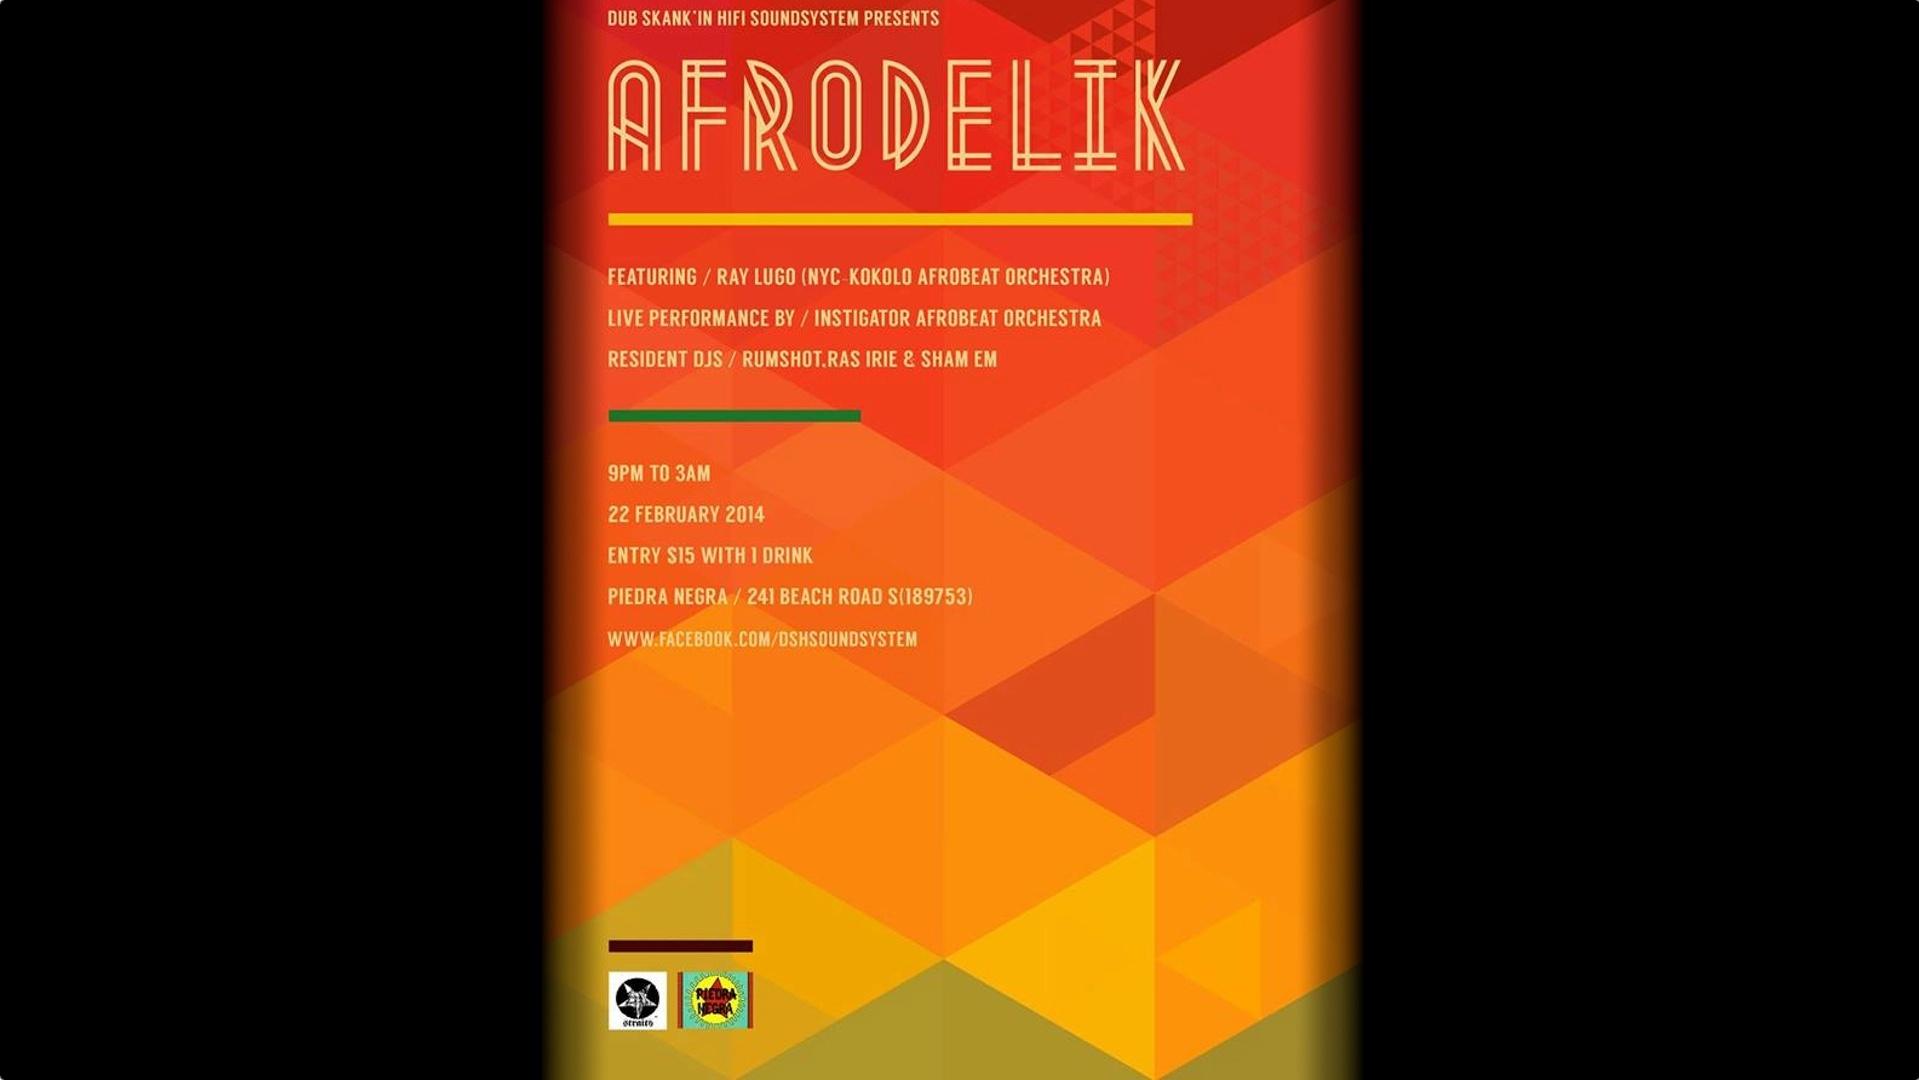 Afrodelik